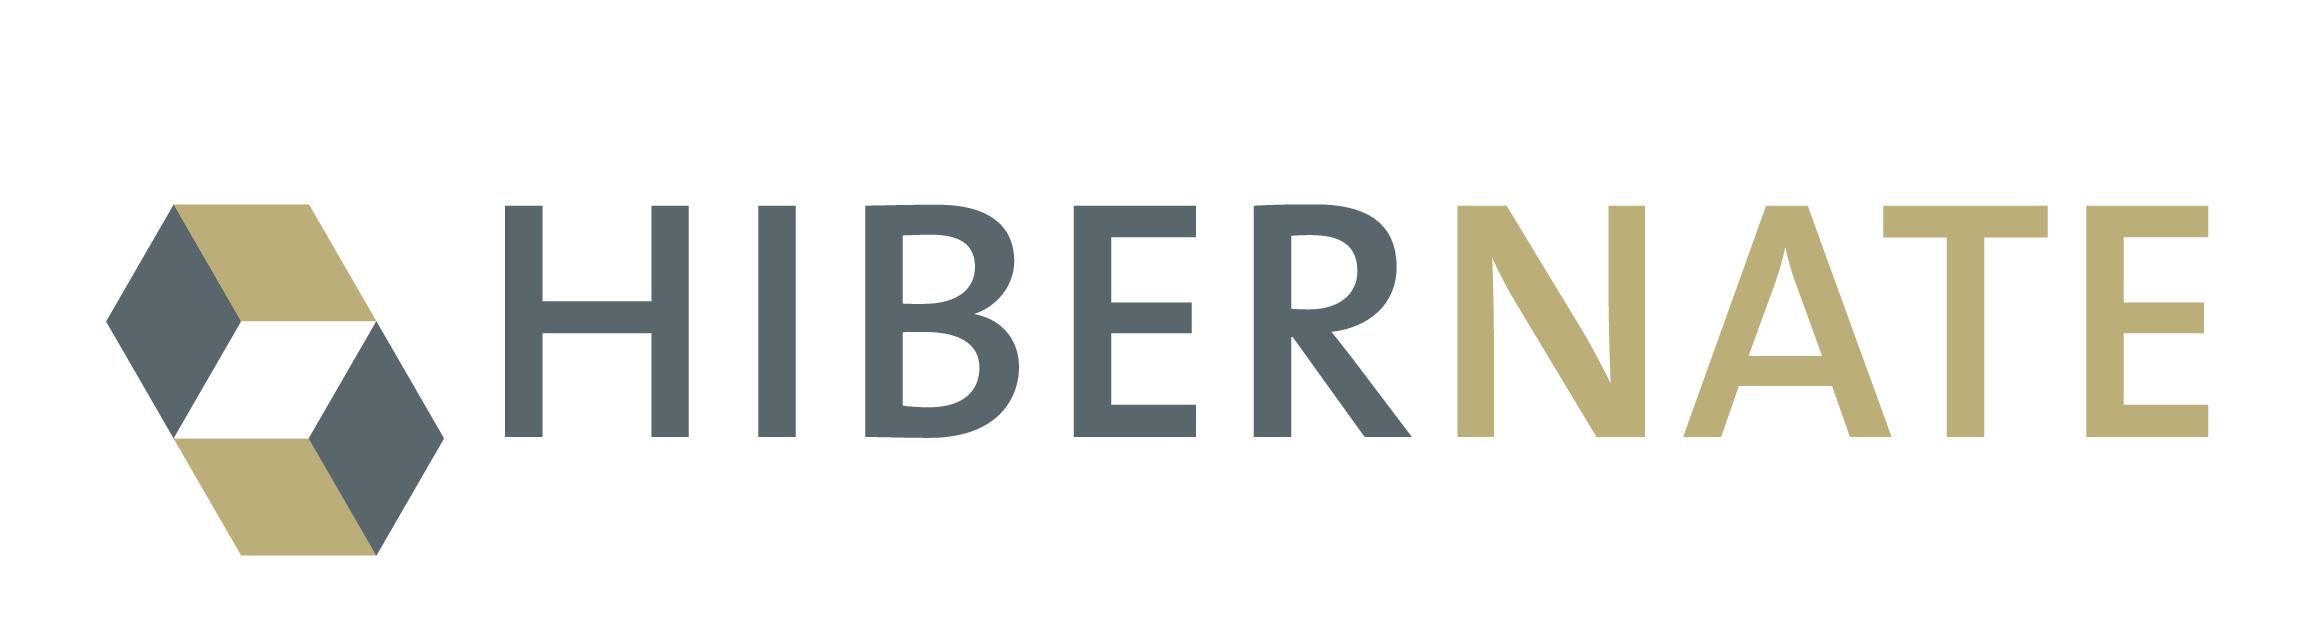 hibernate_logo